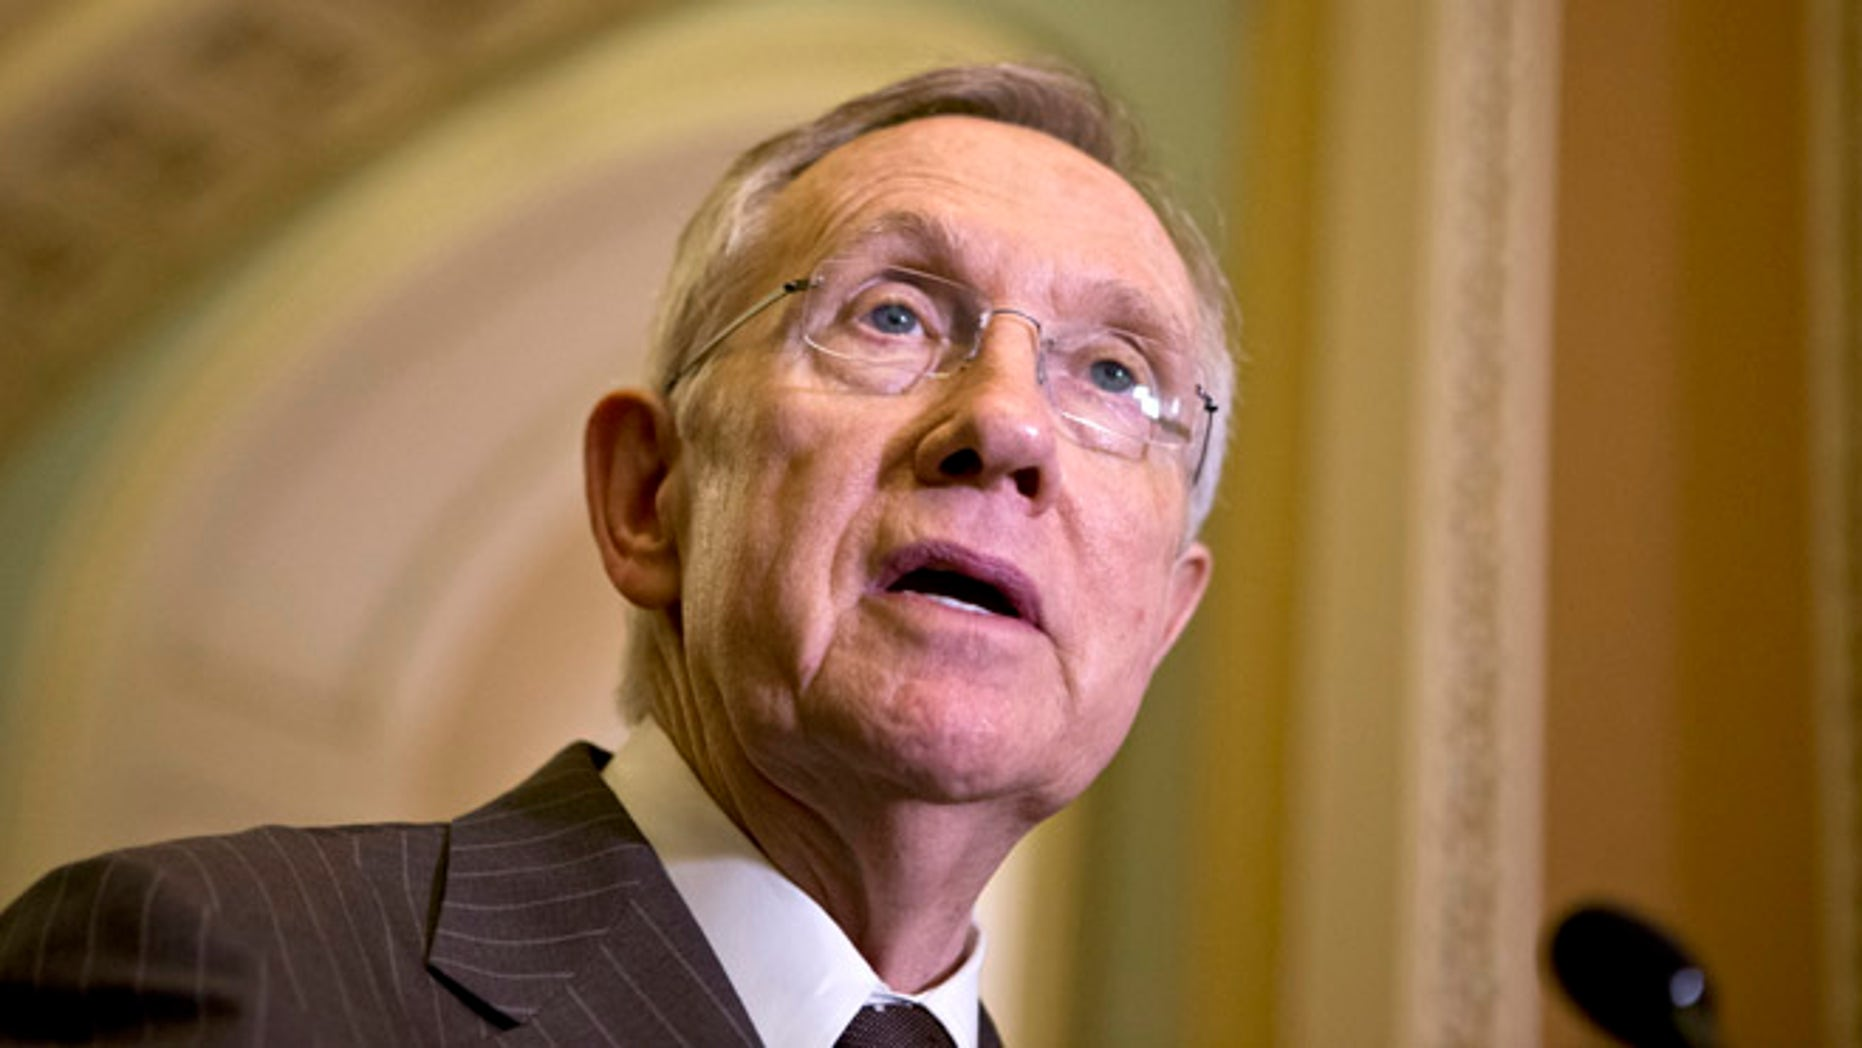 Dec. 11, 2012: Senate Majority Leader Harry Reid speaks with reporters on Capitol Hill in Washington.